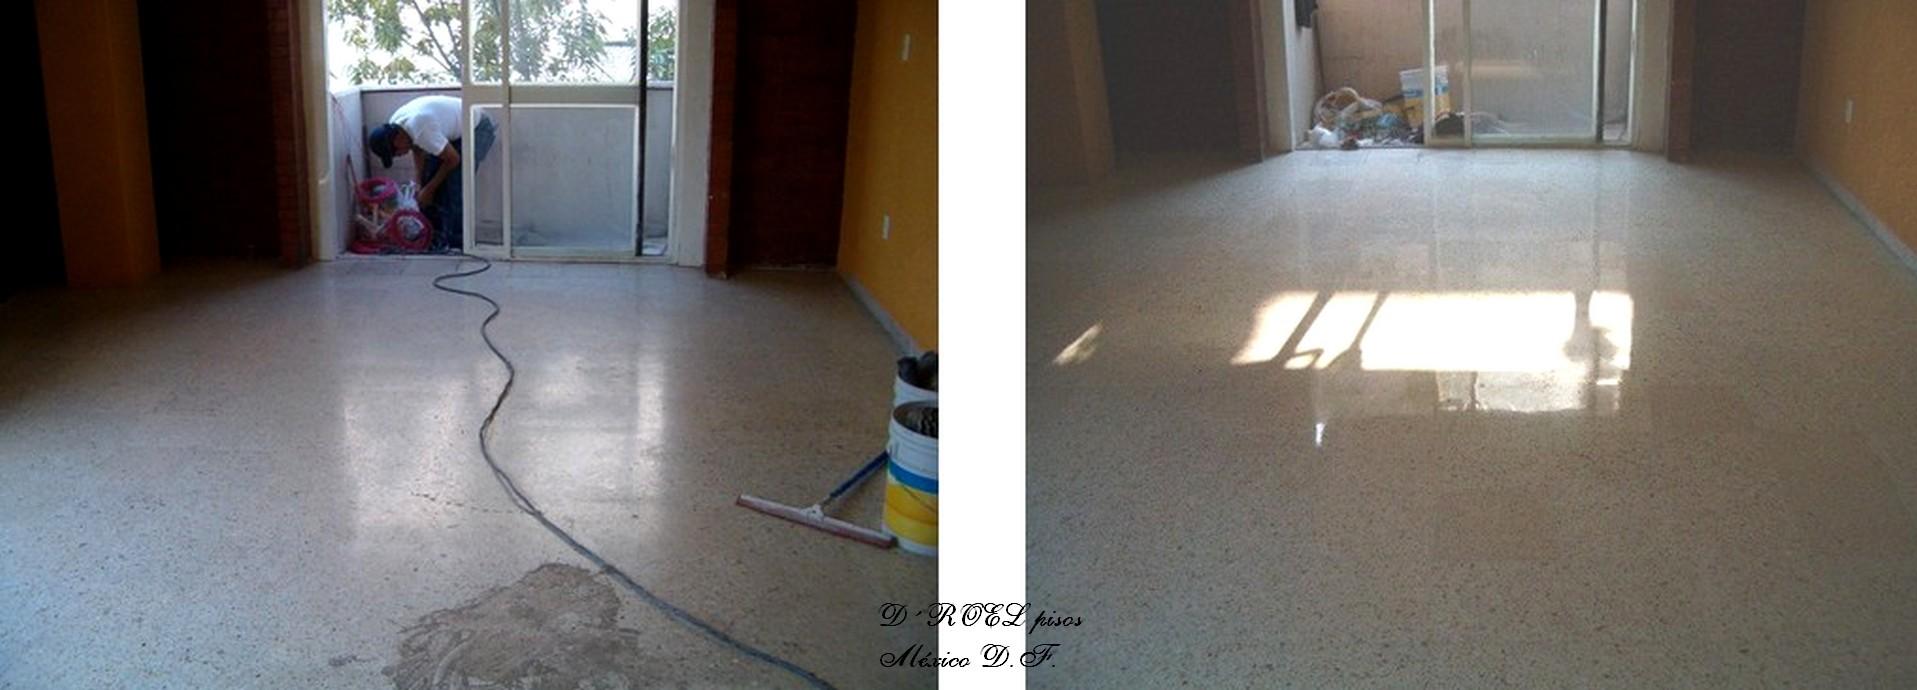 Pulido de pisos de granito hm4 pisos a mxn 90 en for Pulido de pisos de granito